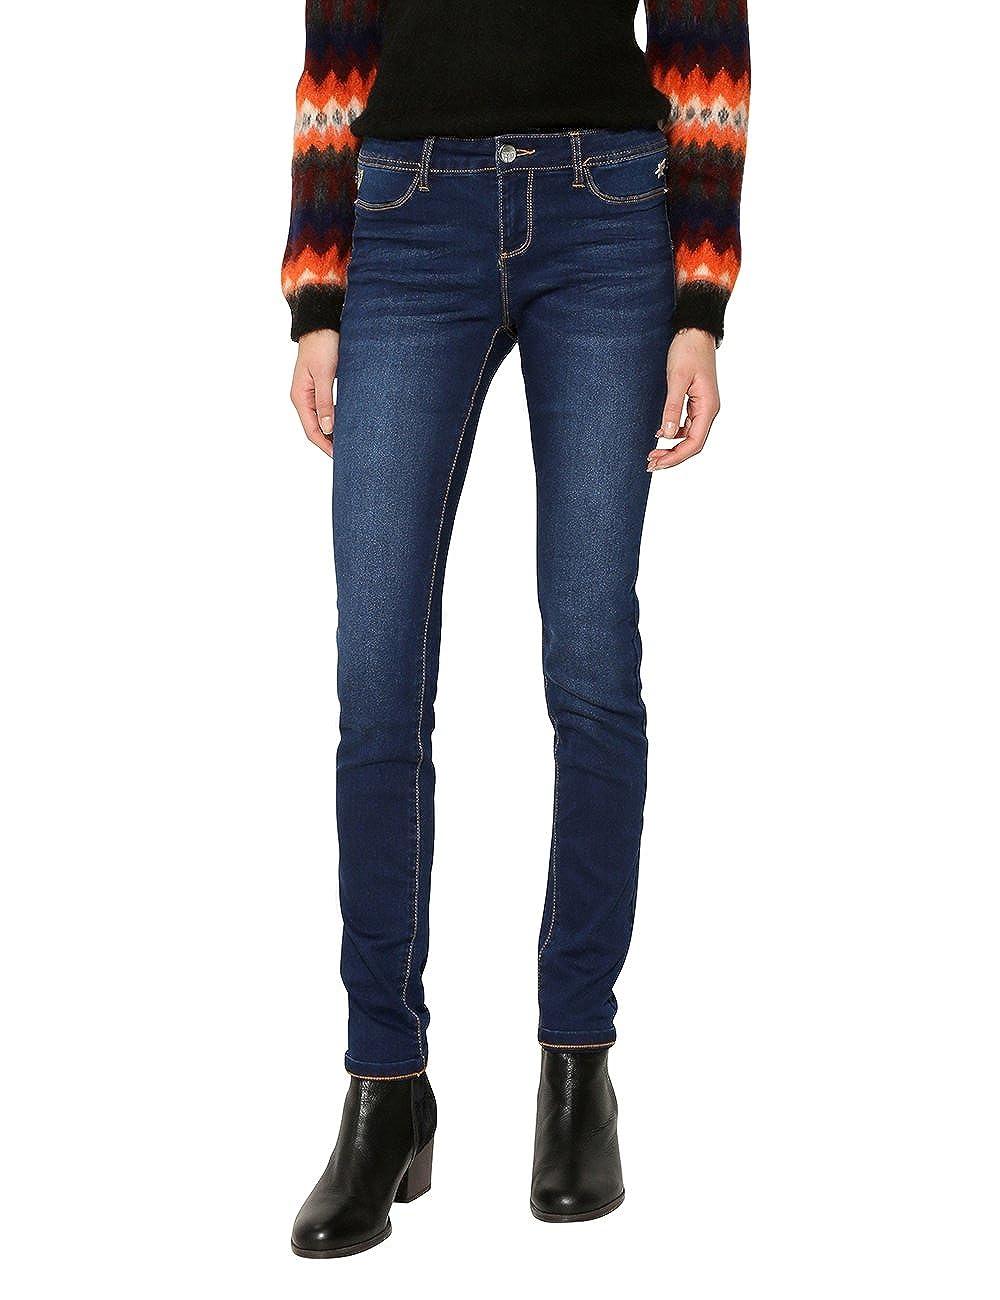 TALLA W29. Desigual Denim_Second Skin Jeans Ajustados para Mujer